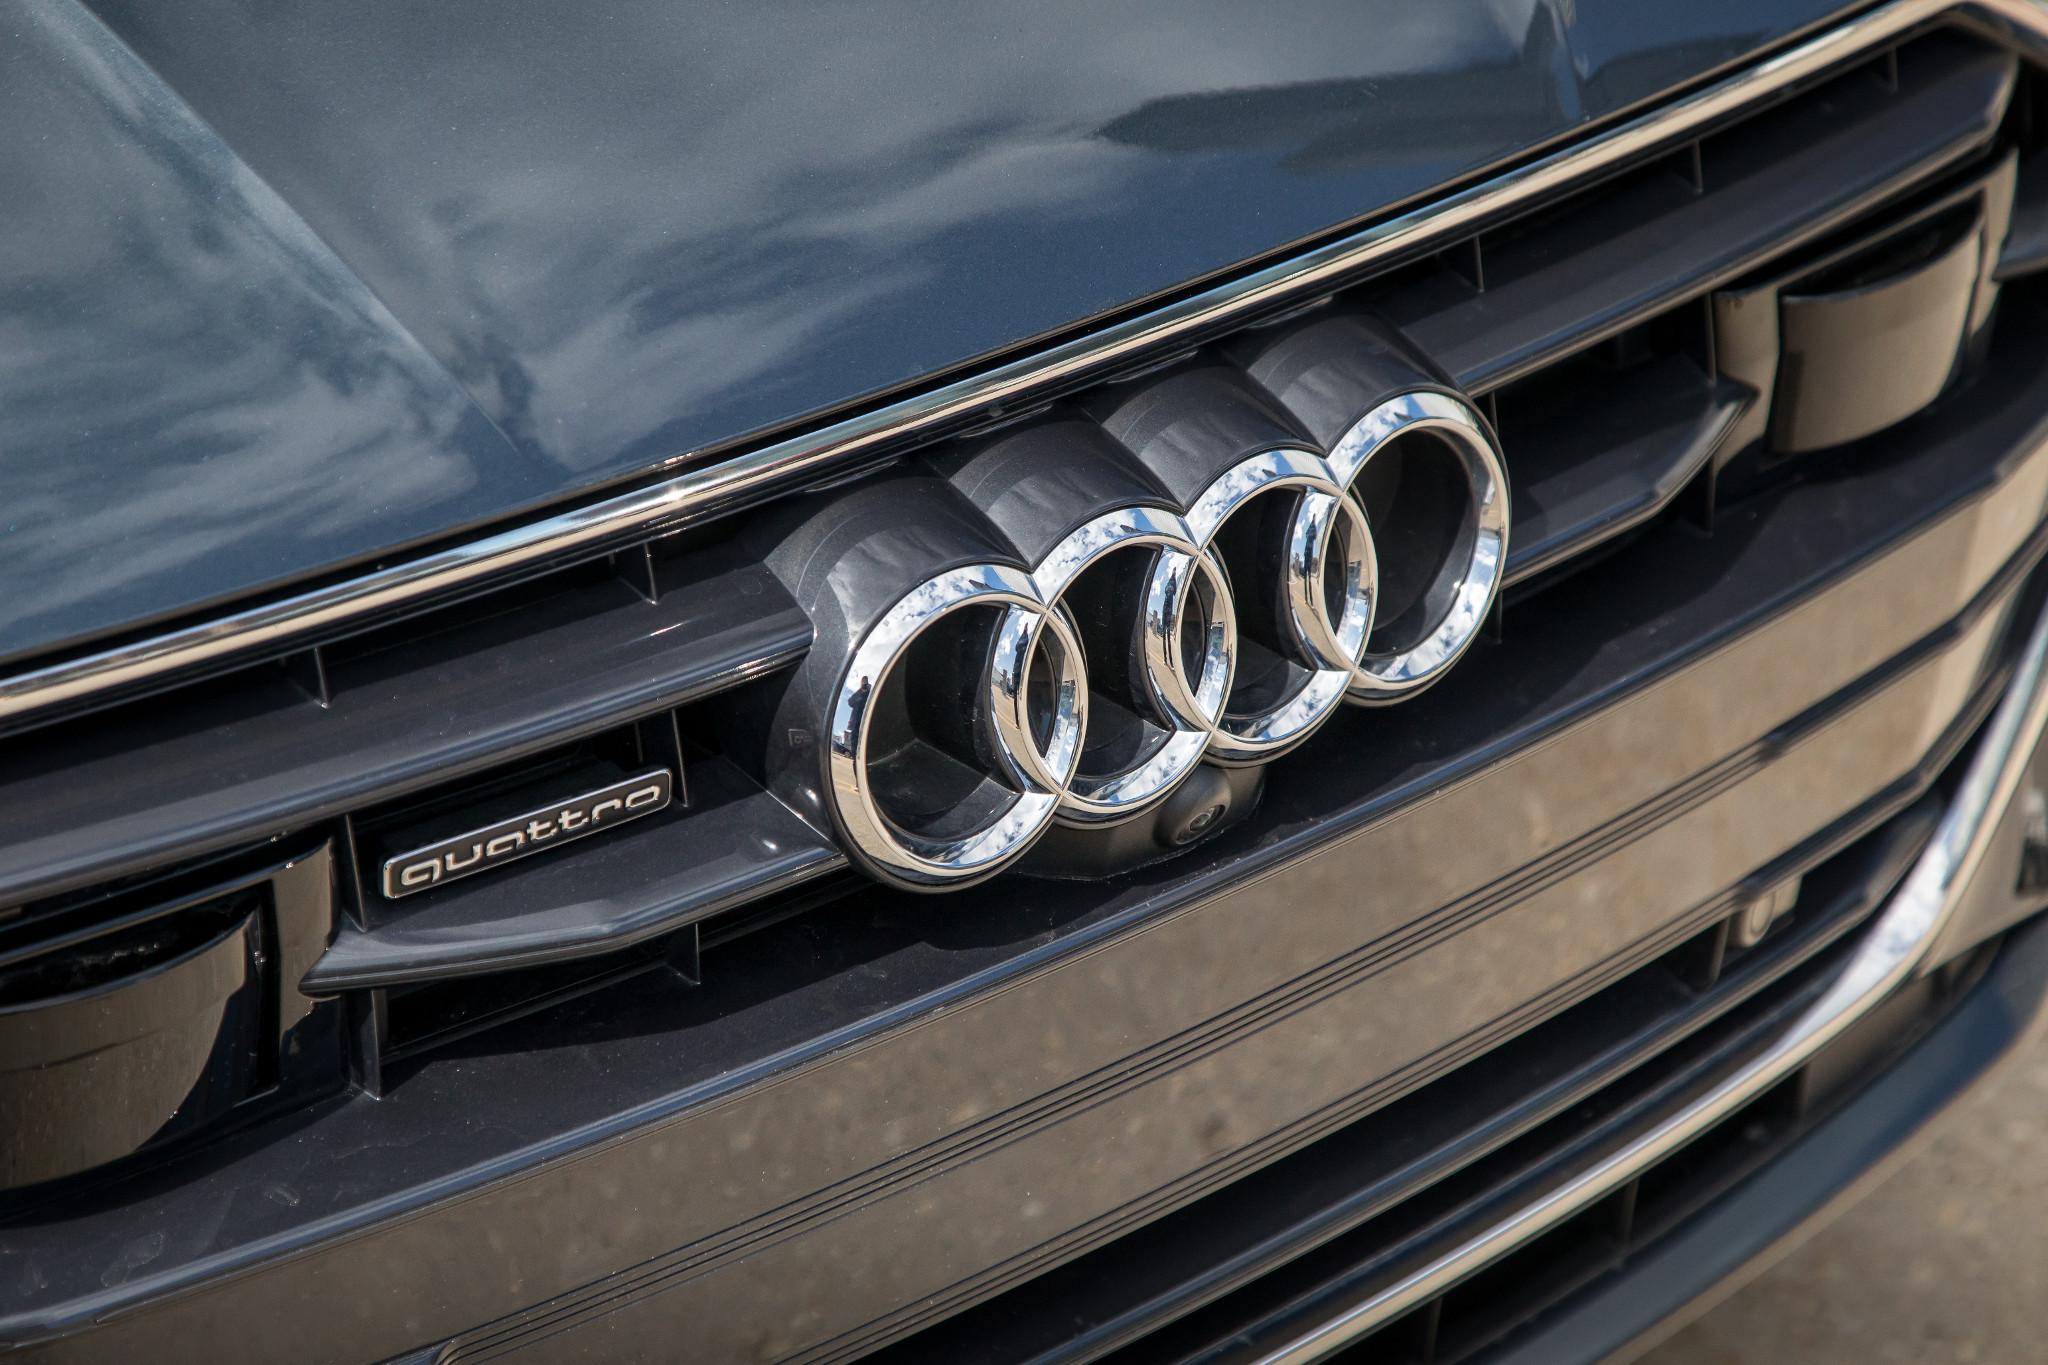 How Do You Pronounce Audi Properly?